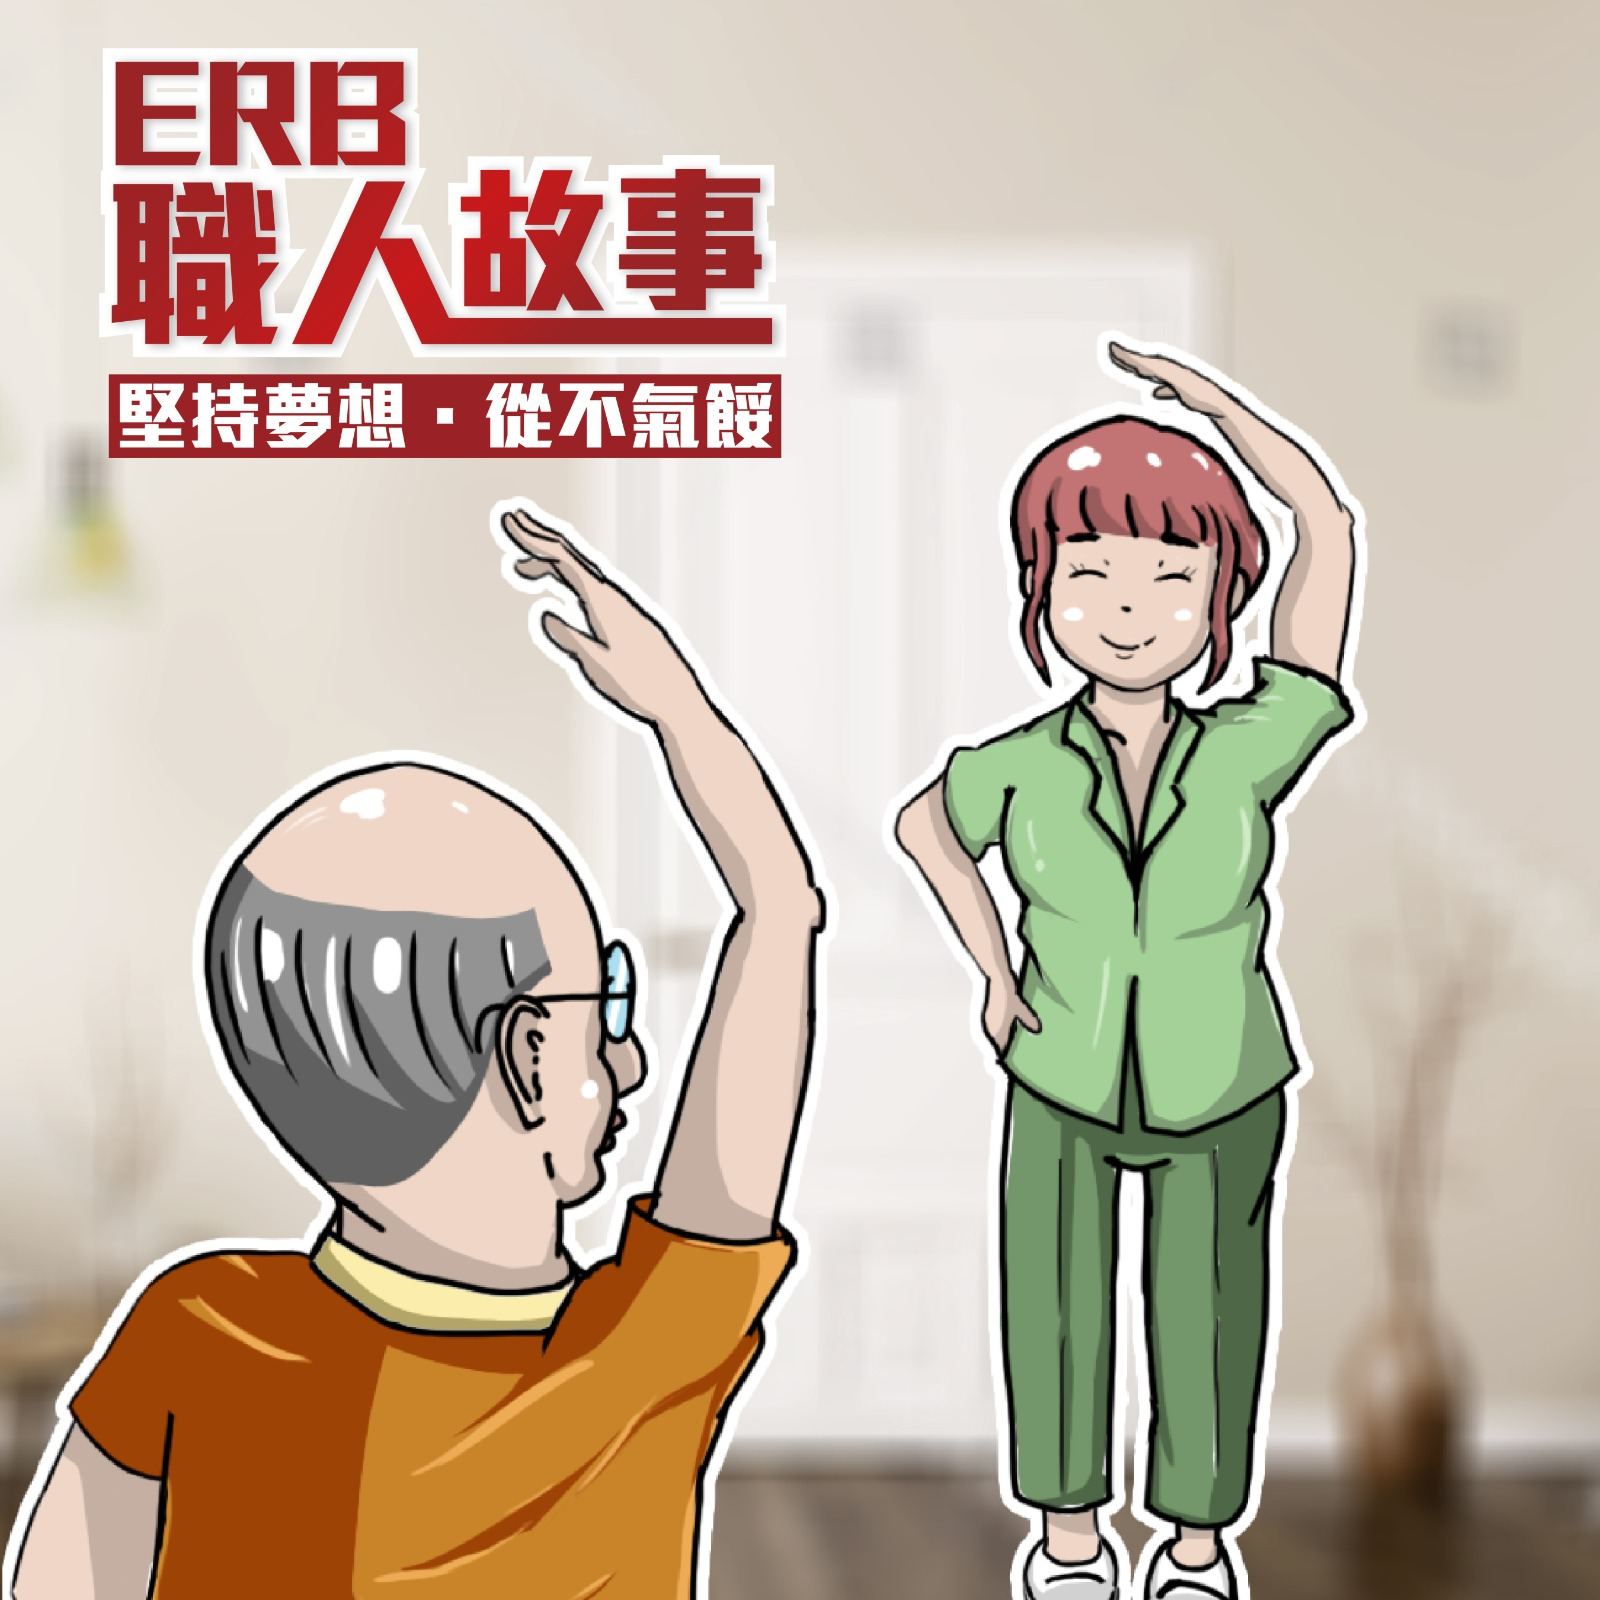 ERB職人故事︰青年學員